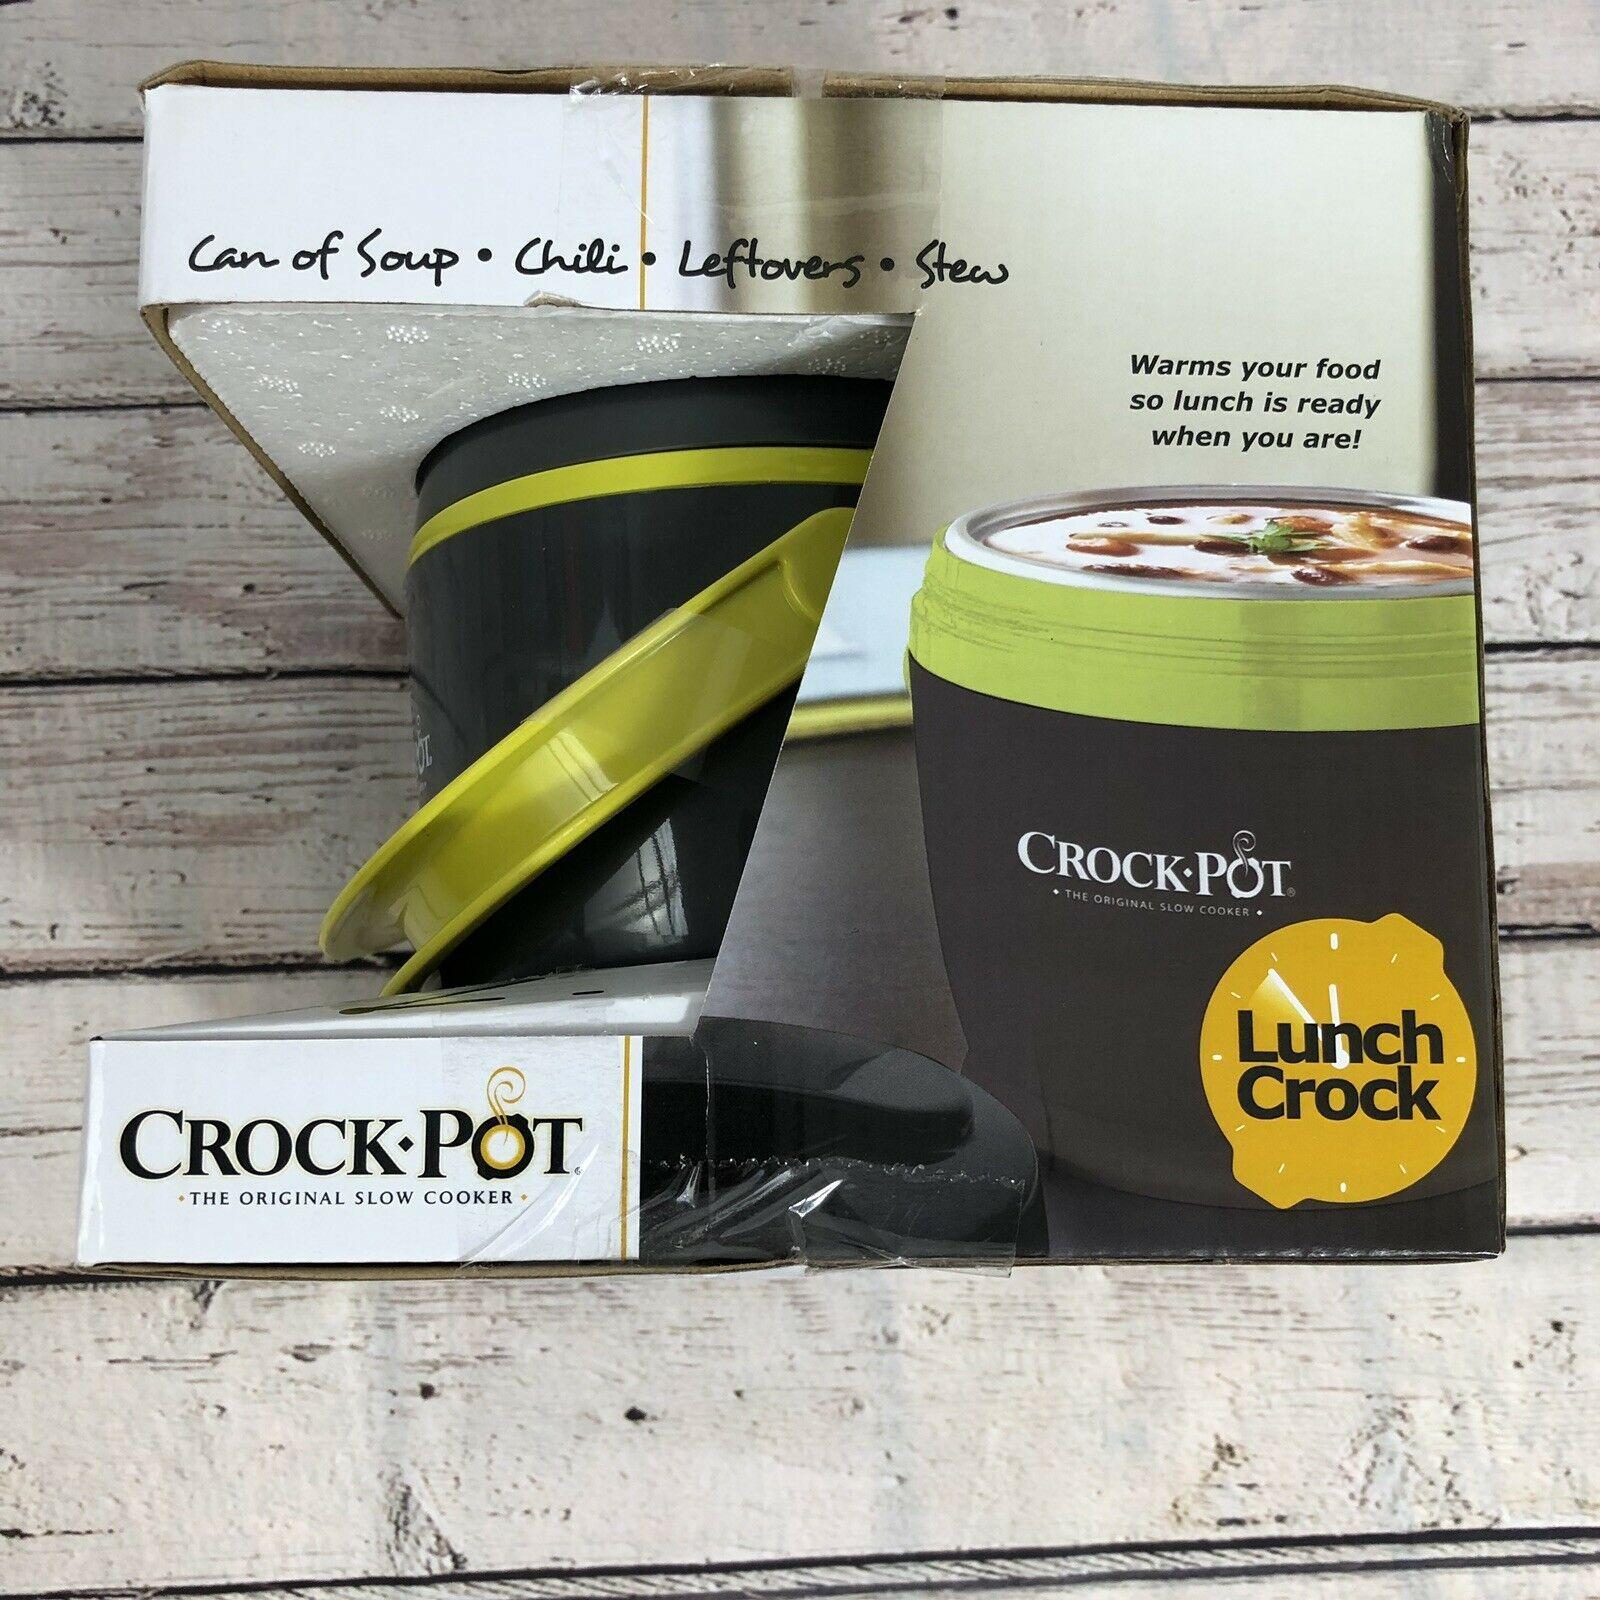 Crock Pot Lunch Crock Food Warmer image 2